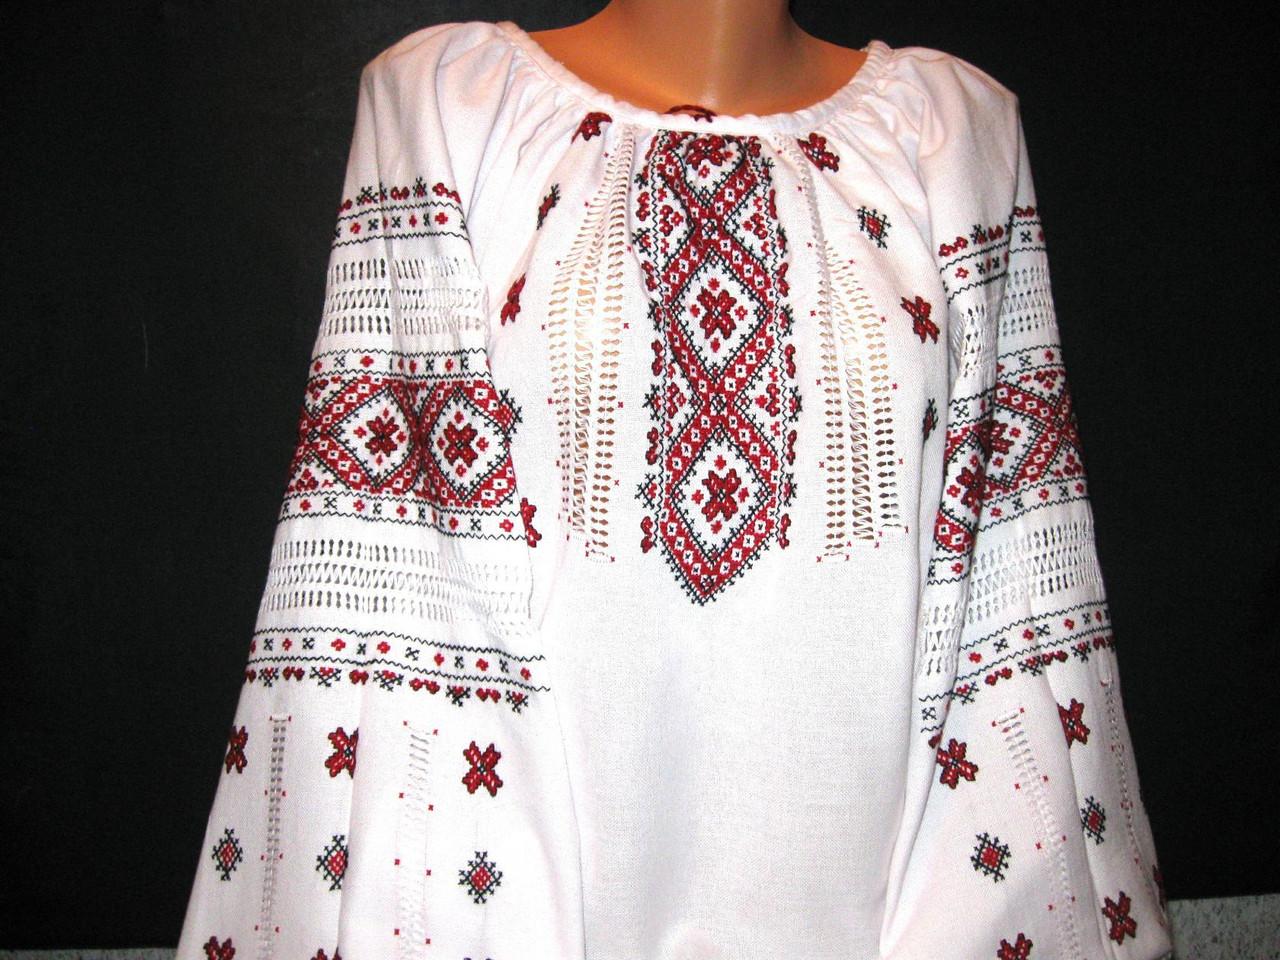 Вишиванка жіноча № 29 - Хаус-пласт в Черкассах 2eec49340b9aa